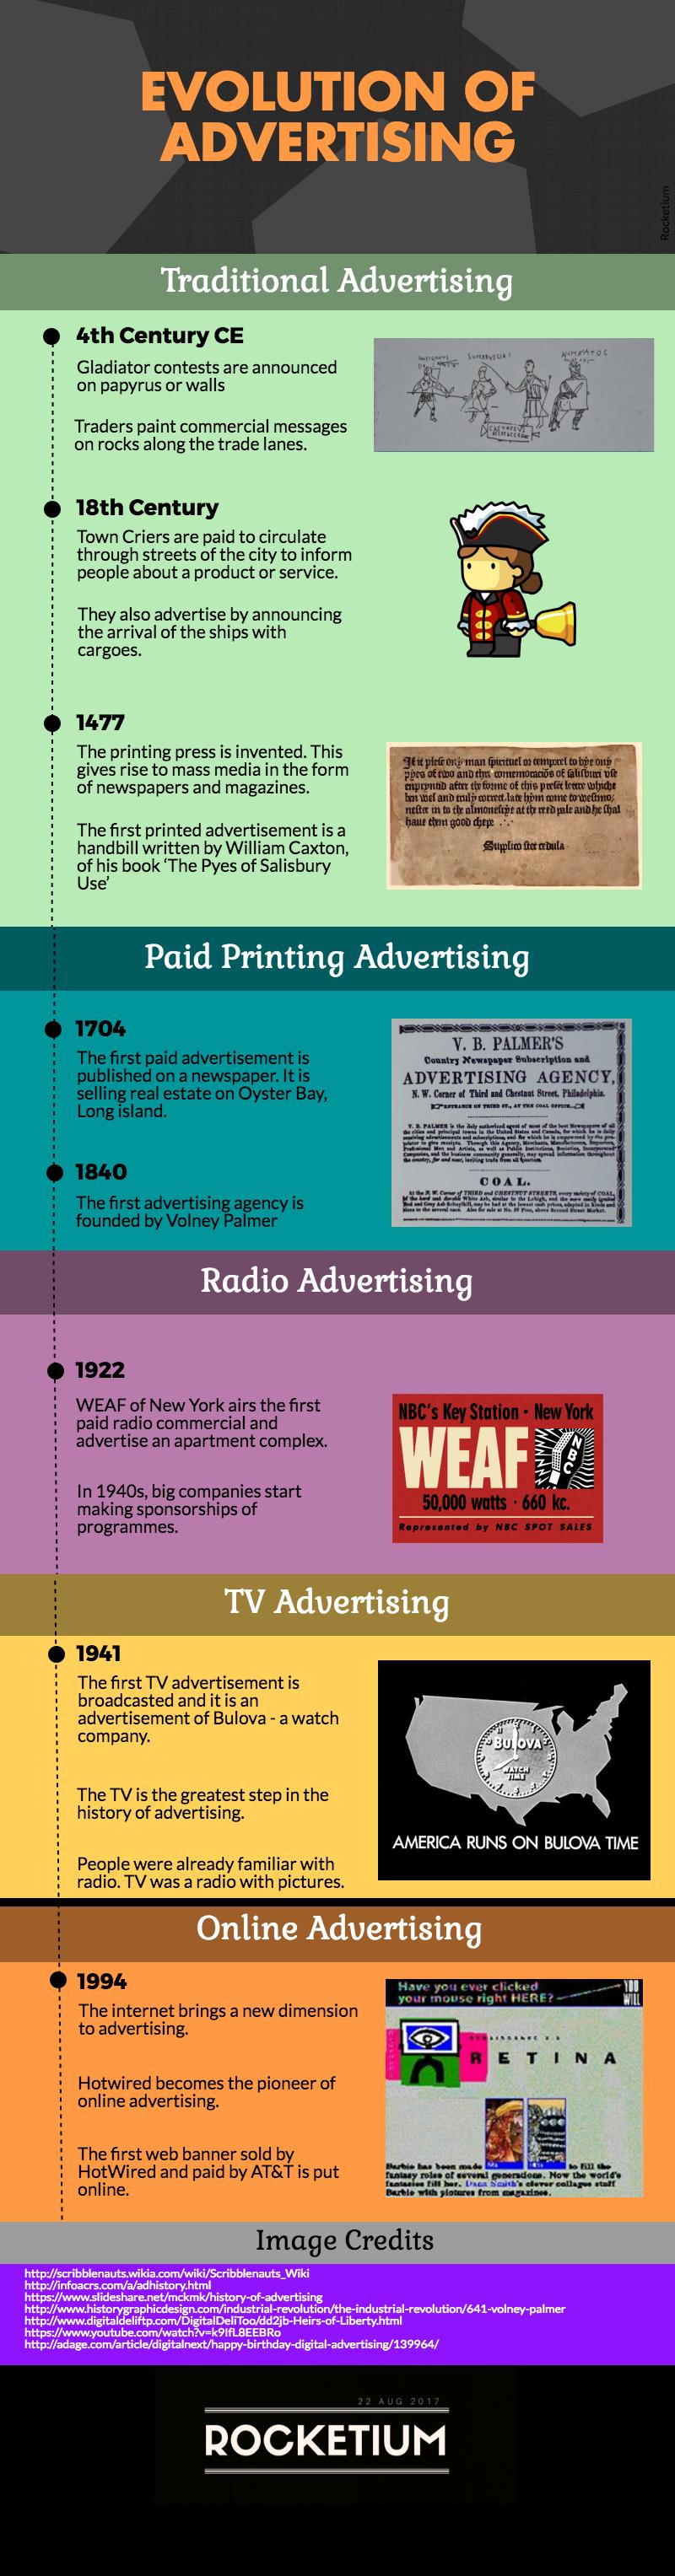 infographic evolution of advertisements Rocketium